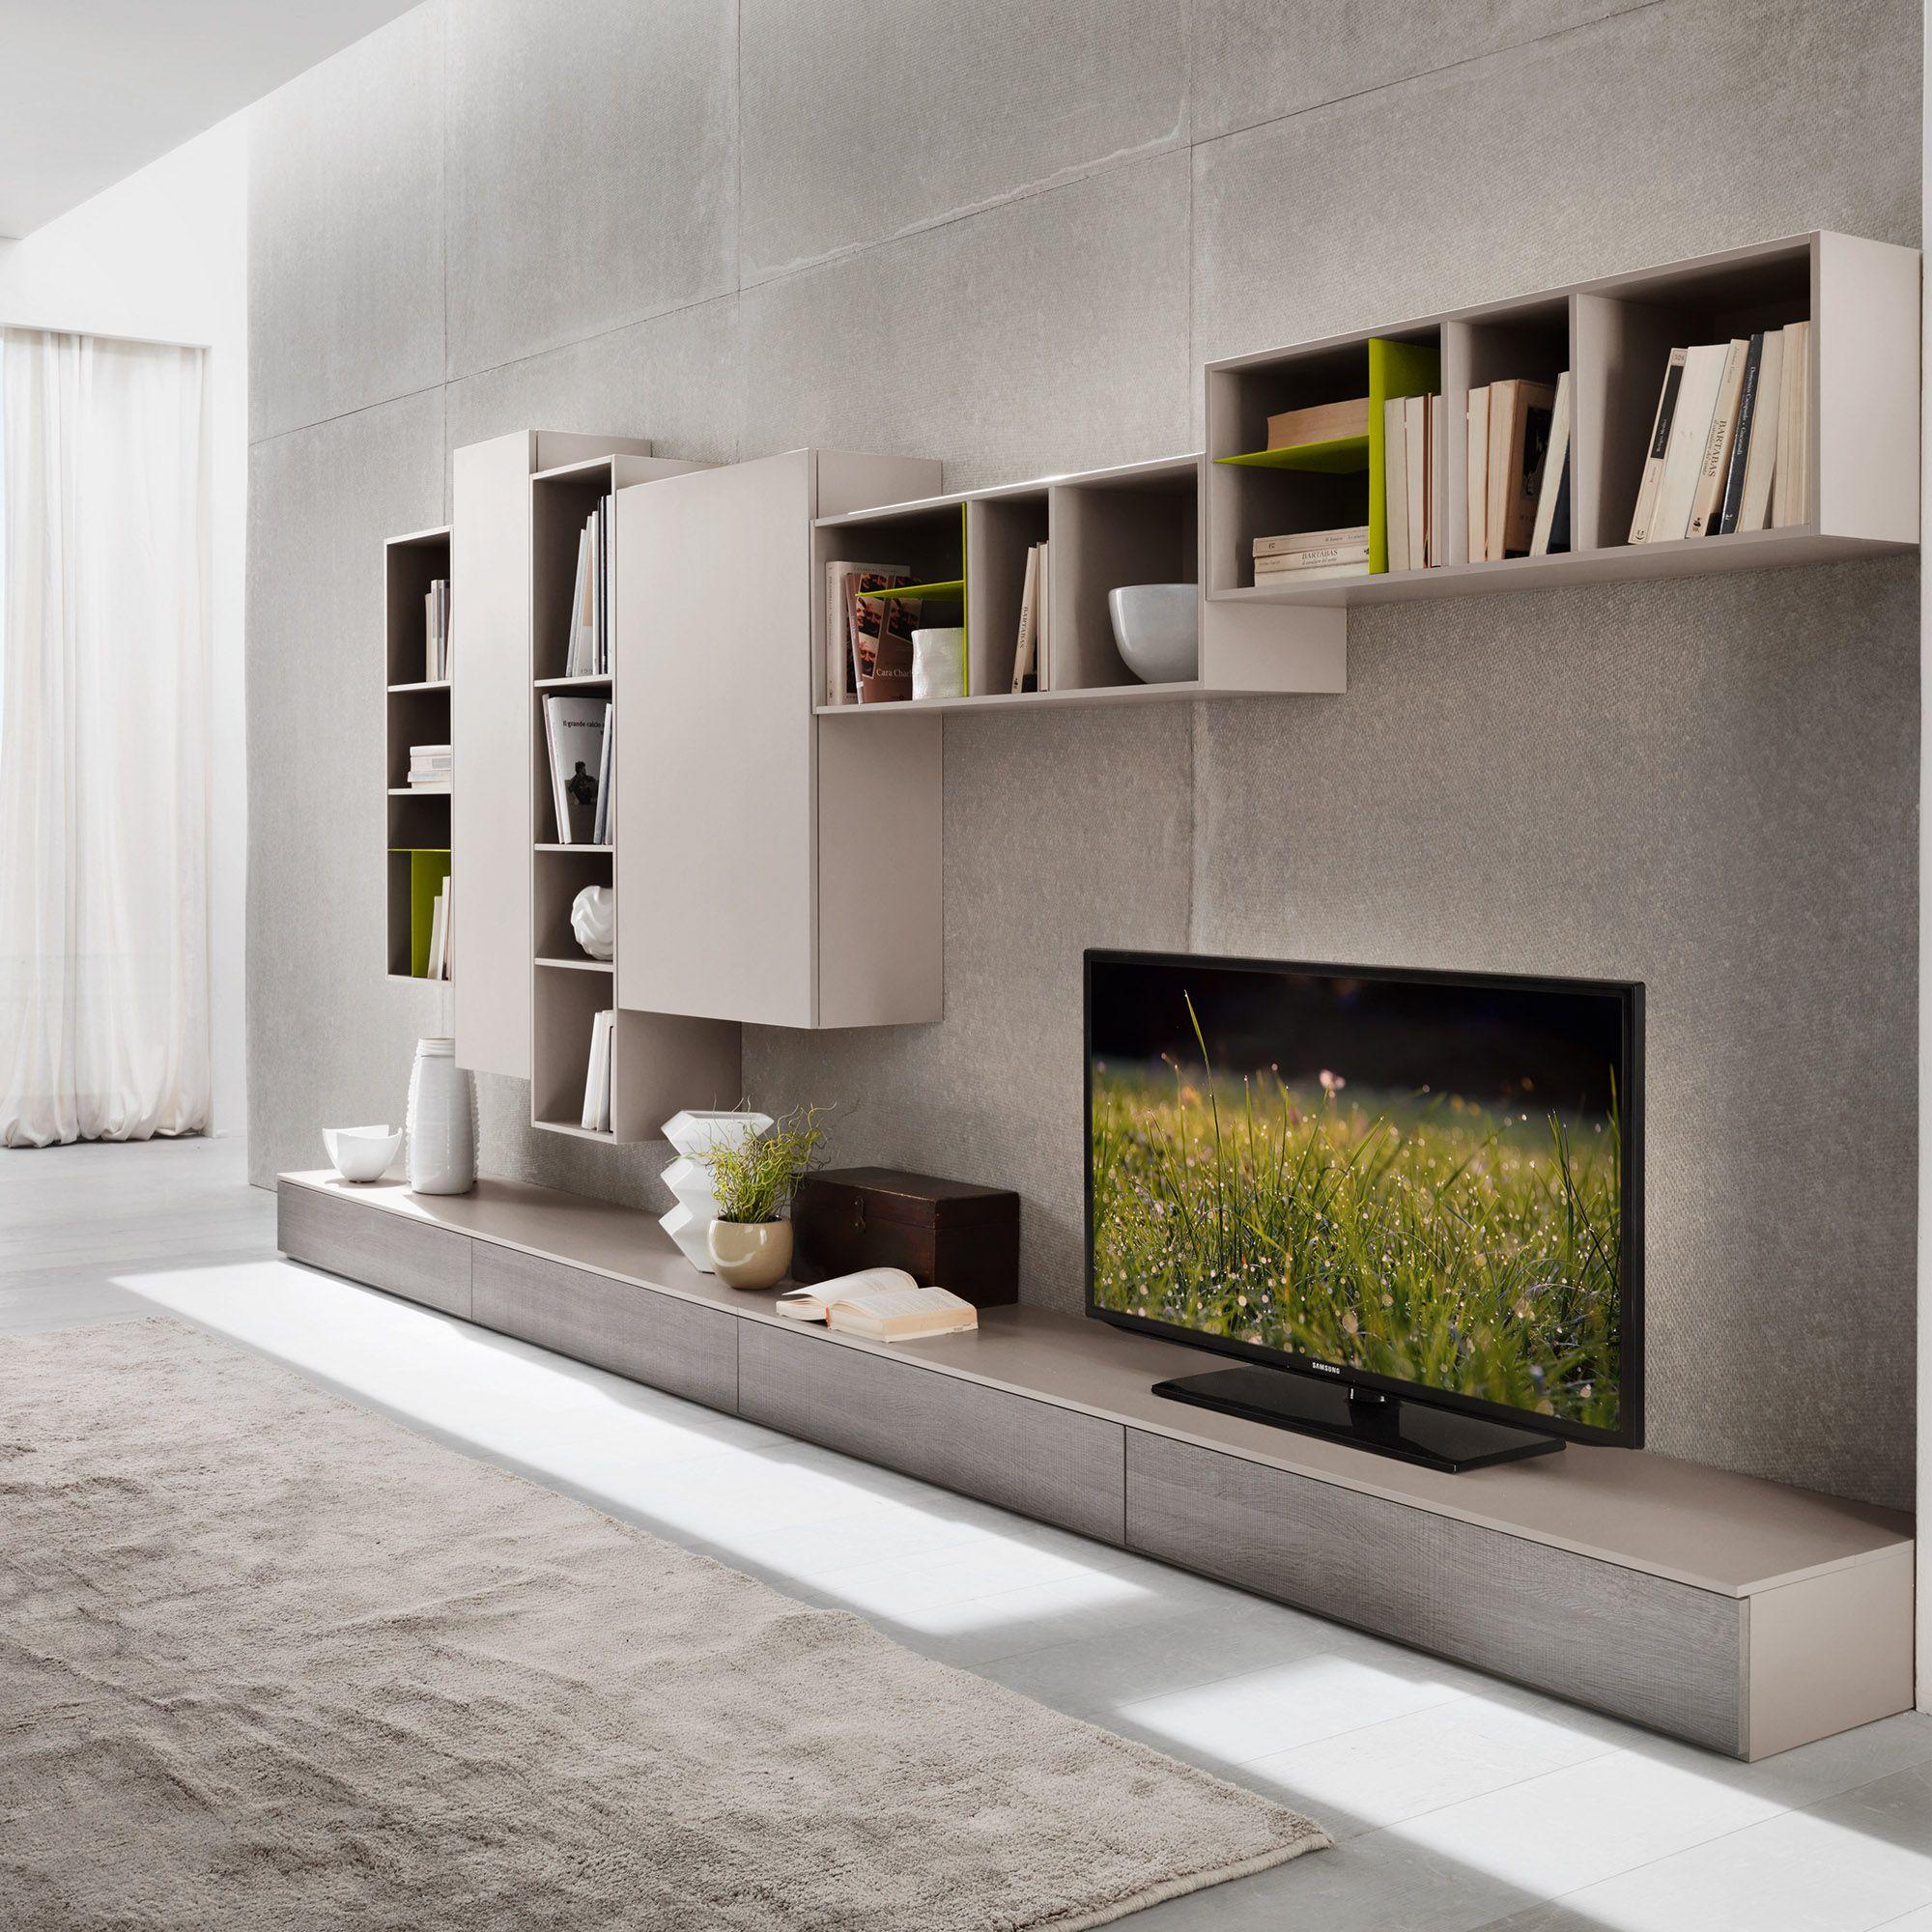 Italian wall units living room - Tv Unit Modern Contemporary Design By Siluetto 360 Cm Length At My Italian Living Ltd